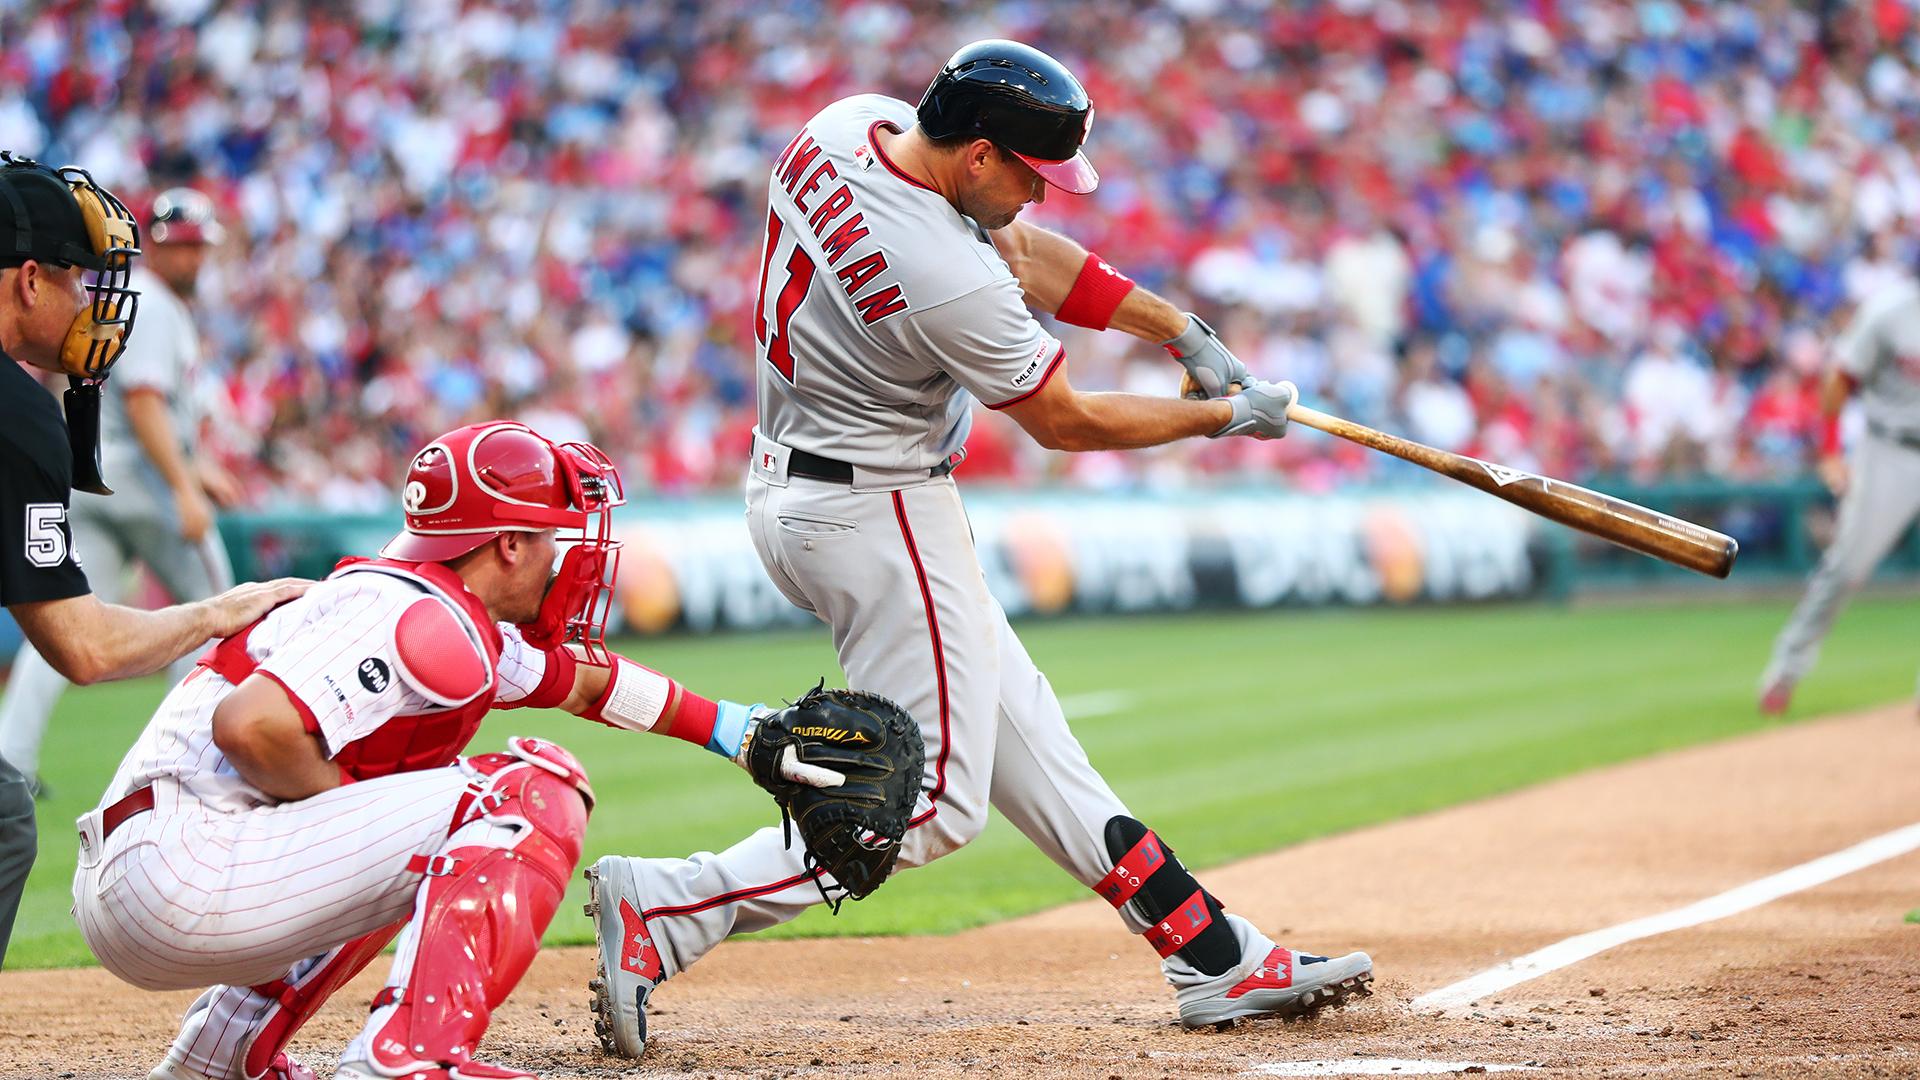 Ian Desmond, Ryan Zimmerman among list of MLB gamers opting out of 2020 season